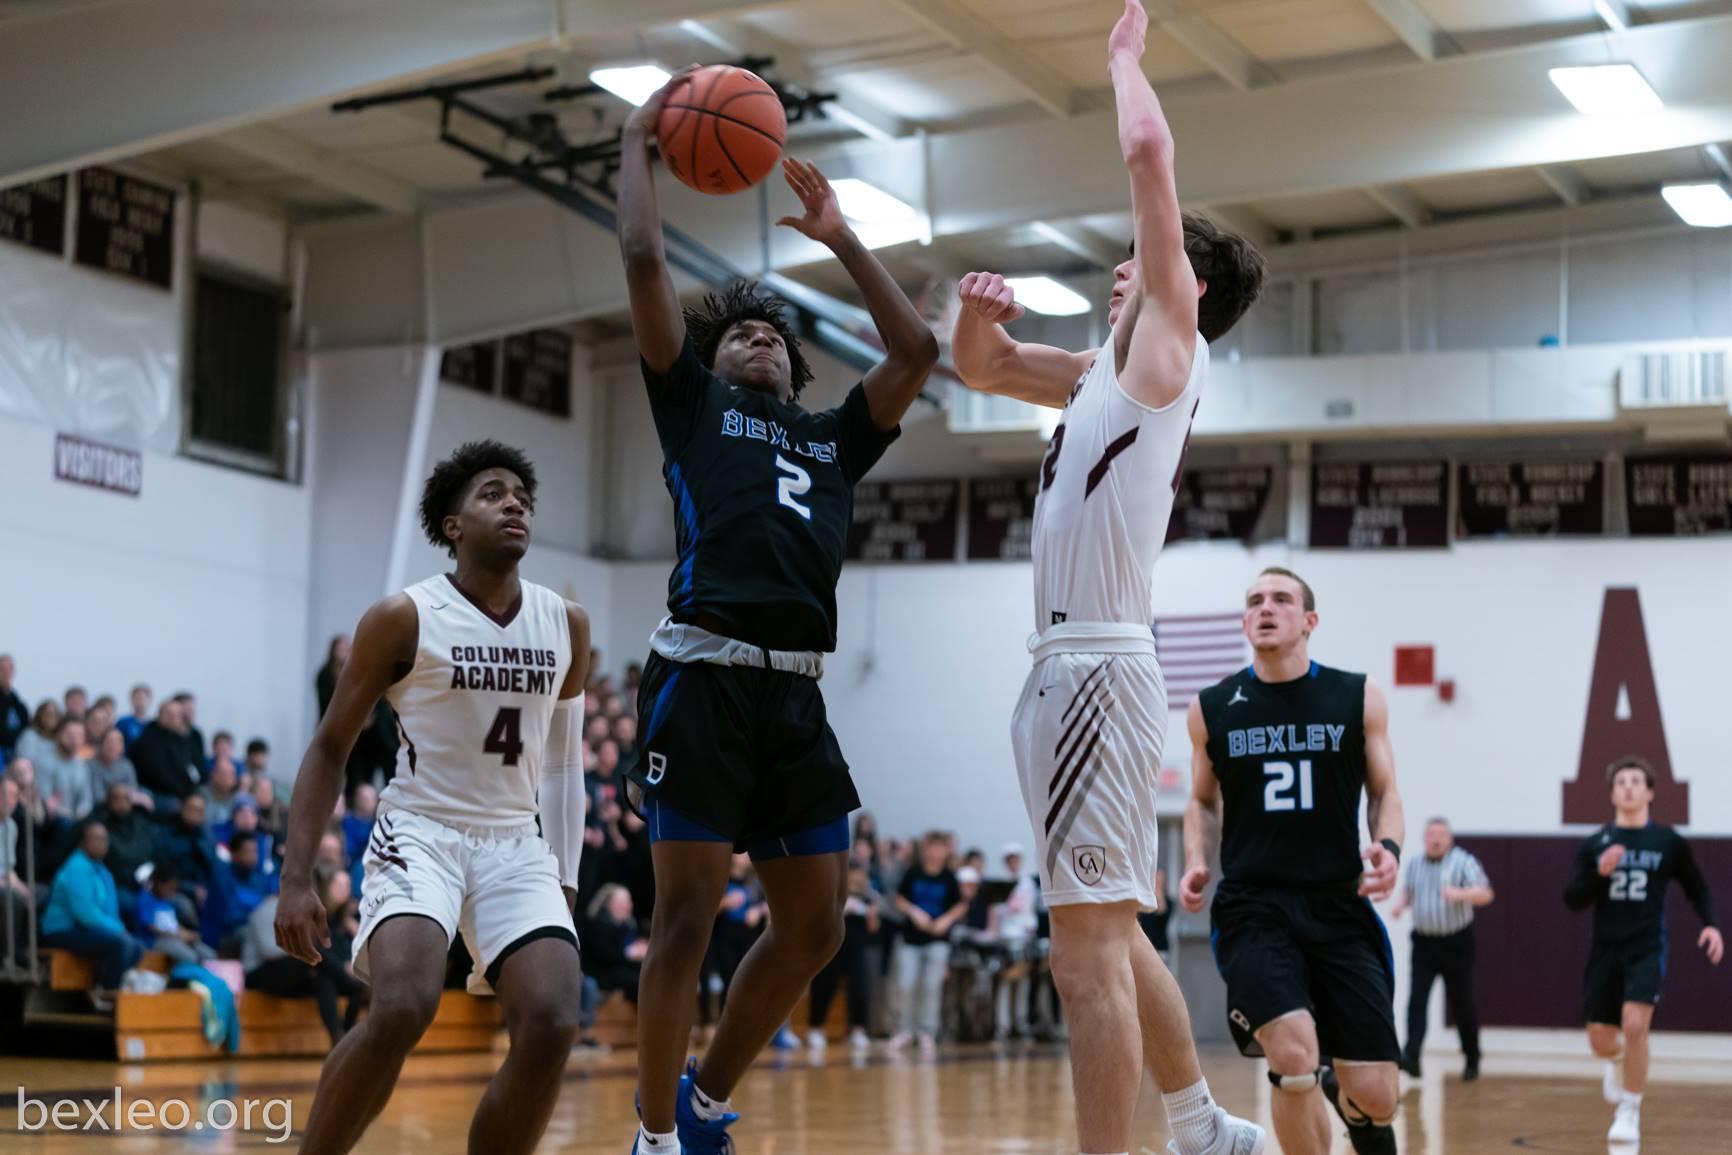 Boys Basketball player drives vs Columbus Academy